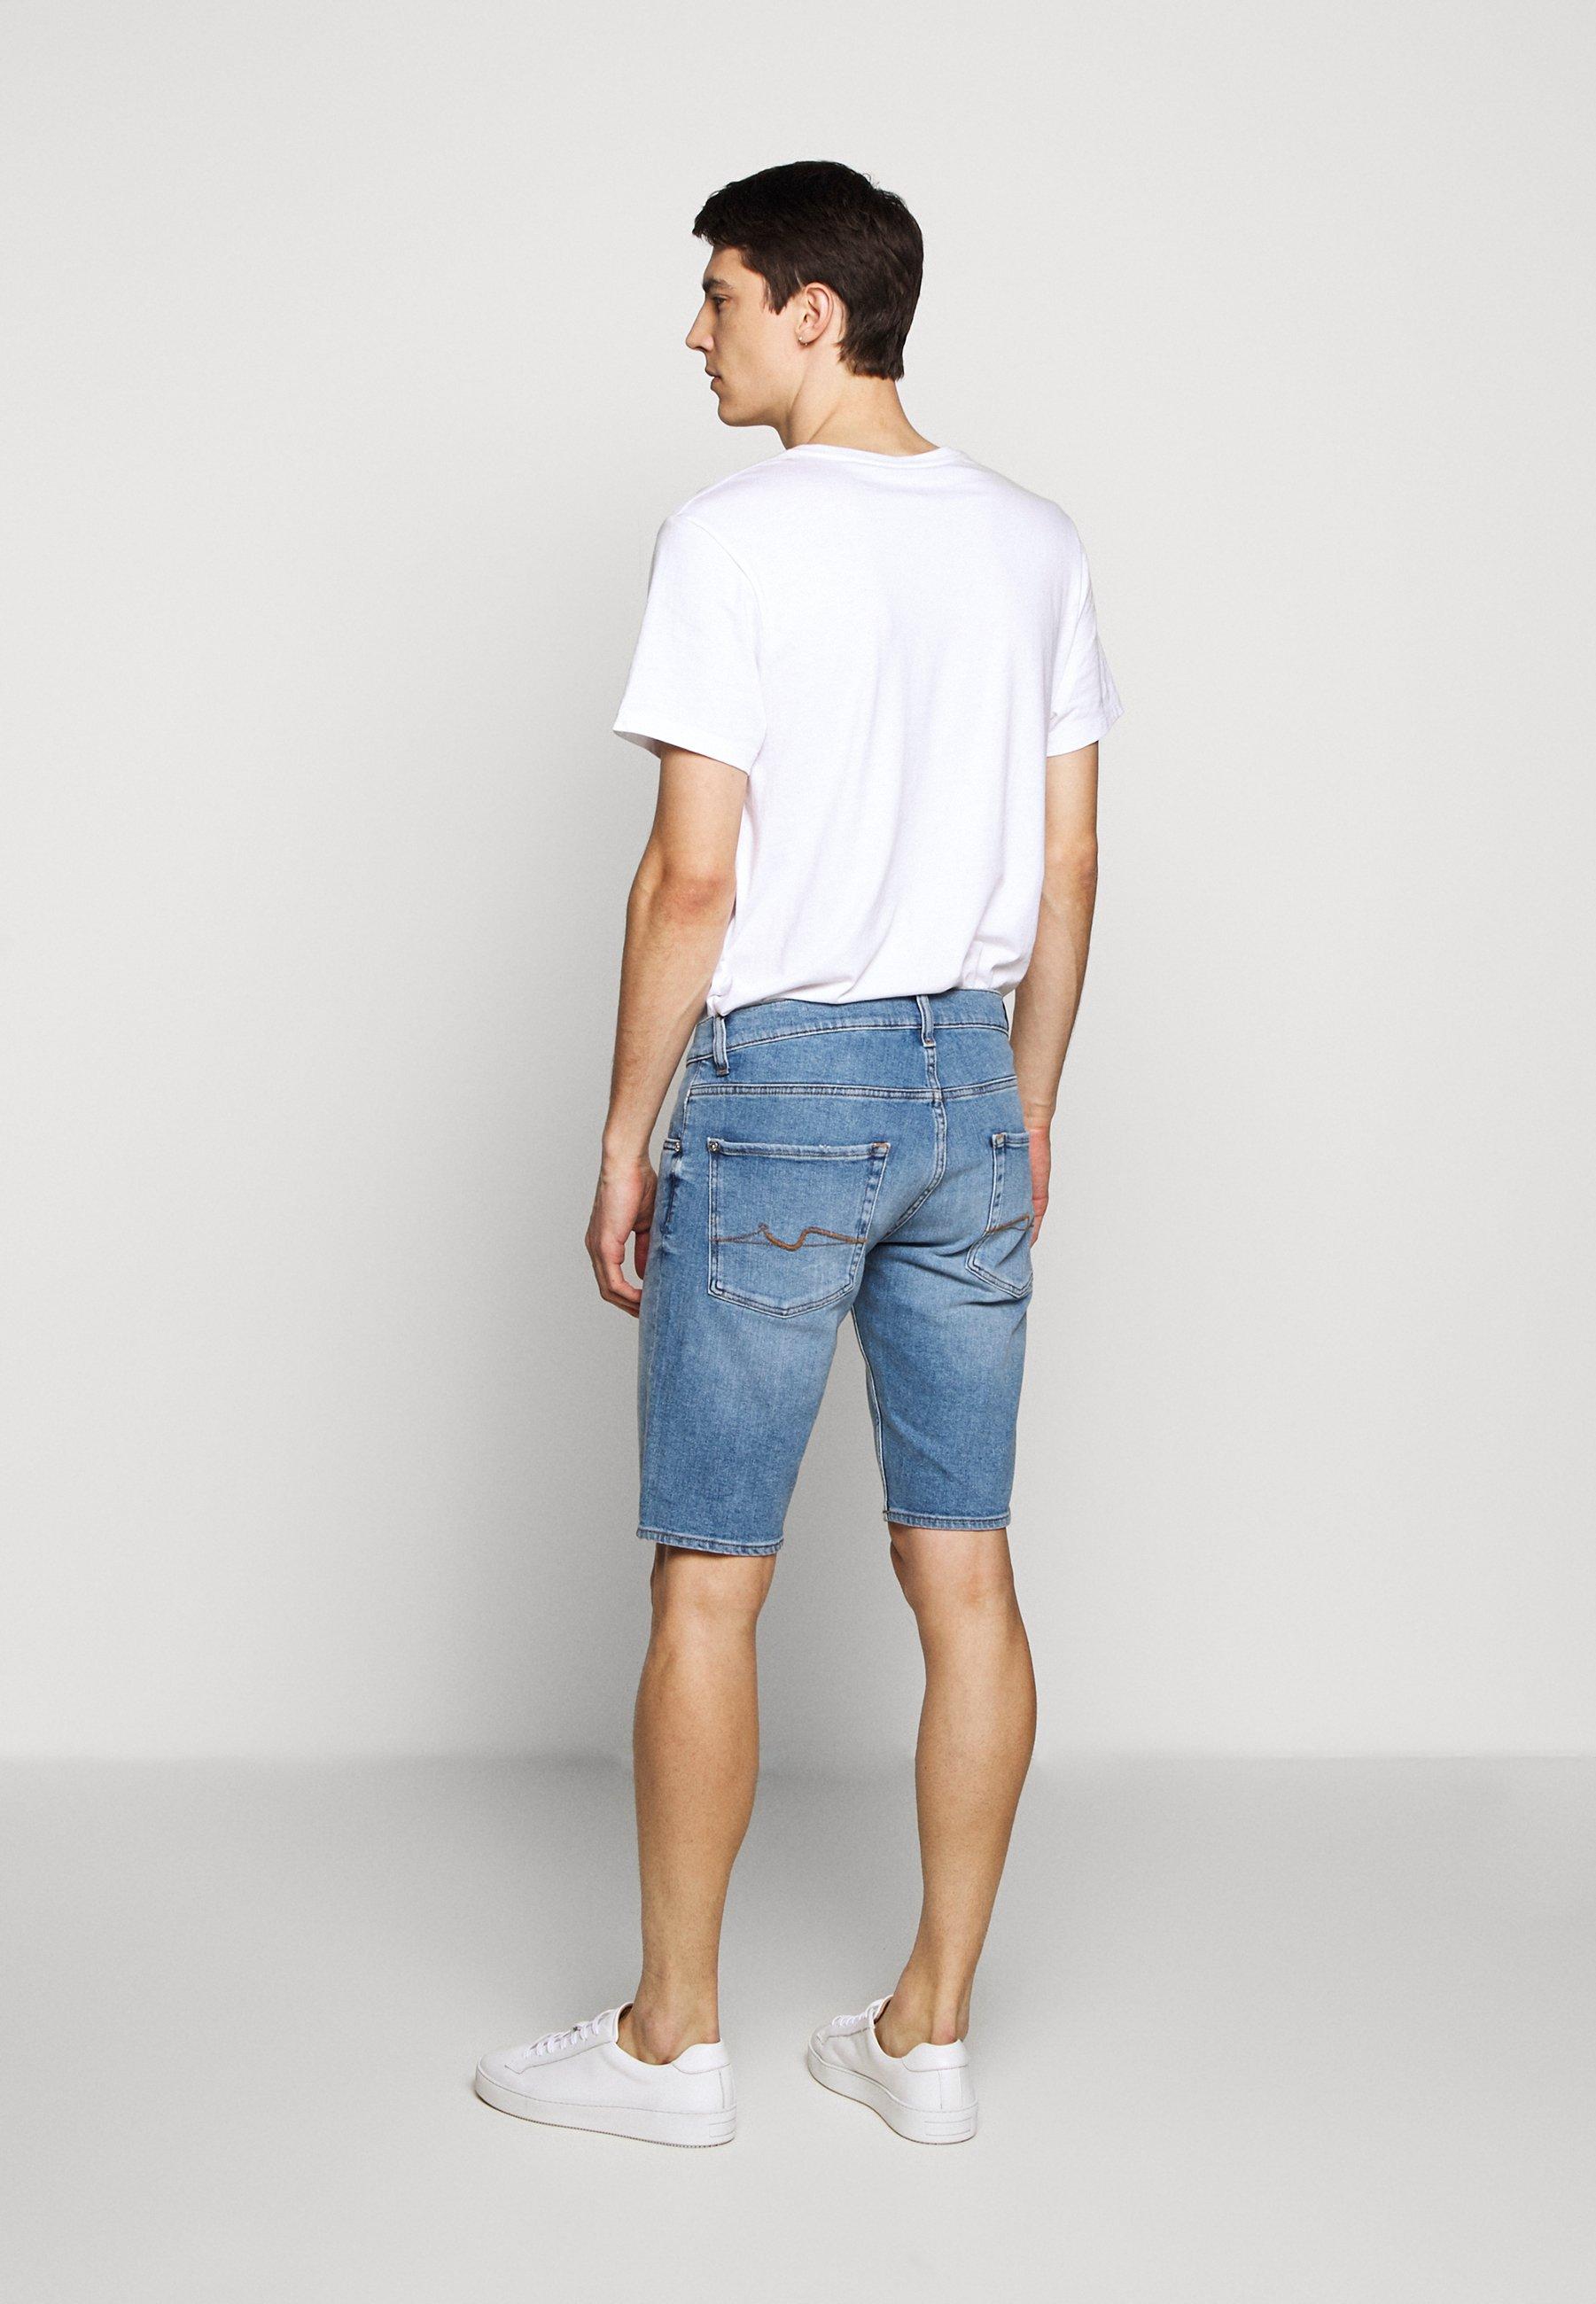 7 For All Mankind Regular Hemet - Jeans Short / Cowboy Shorts Light Blue